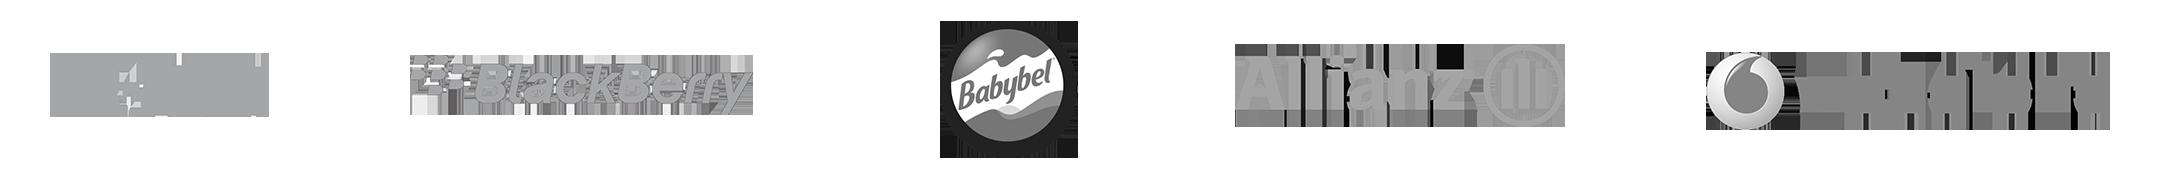 gybe_logos_stripe1_web_181026